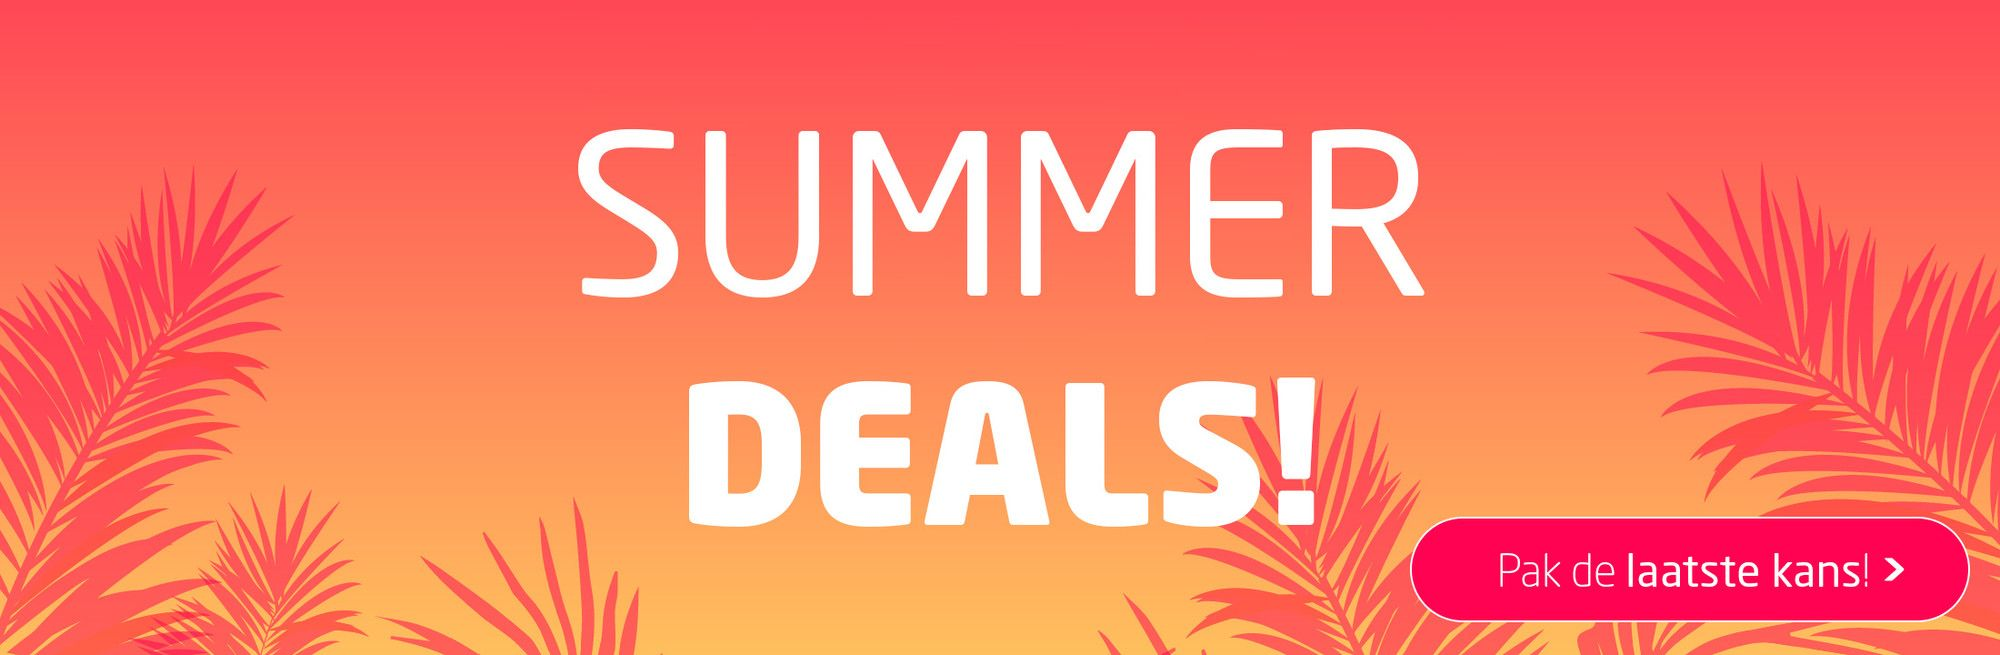 Summer Deals 2019! Pak de laatste kans